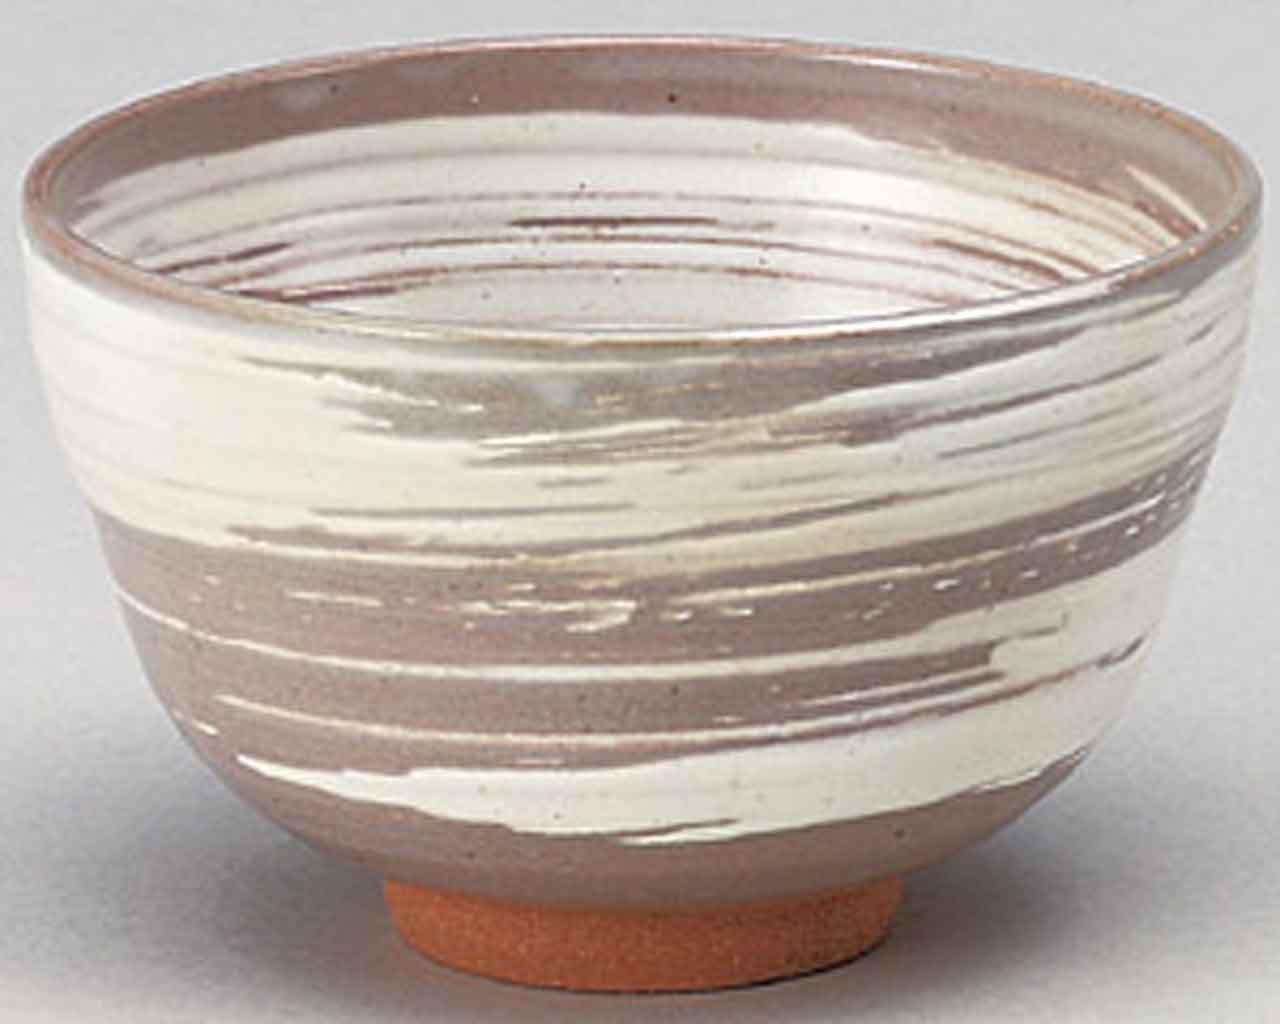 Brush 4.7inch Matcha-Bowl Grey Ceramic Made in Japan by Watou.asia